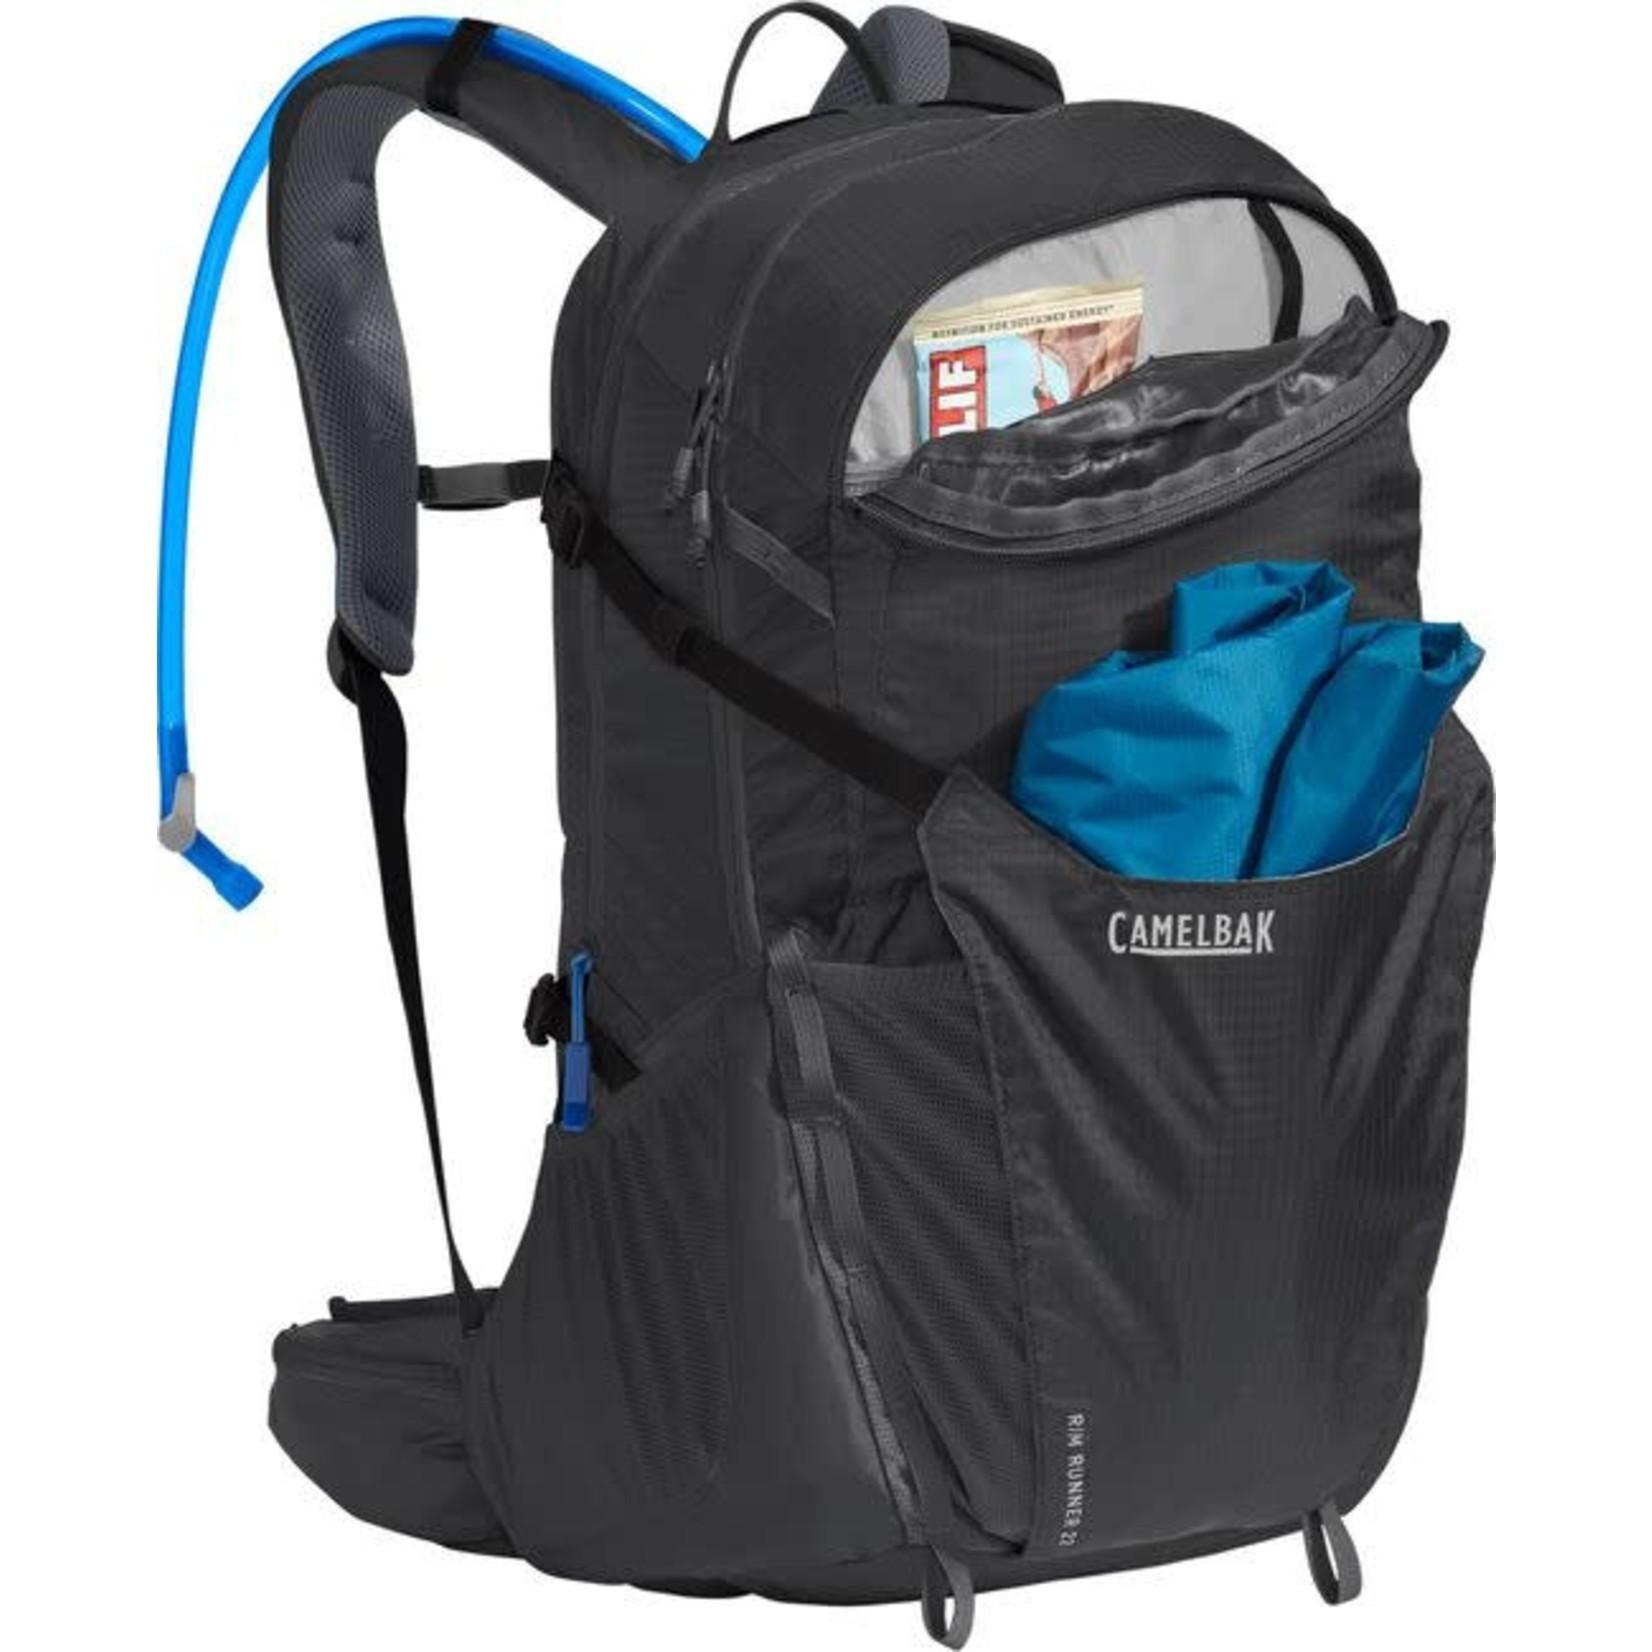 CAMELBAK Backpack, Rim Runner 22, 85oz, Charcoal / Grecian Blue